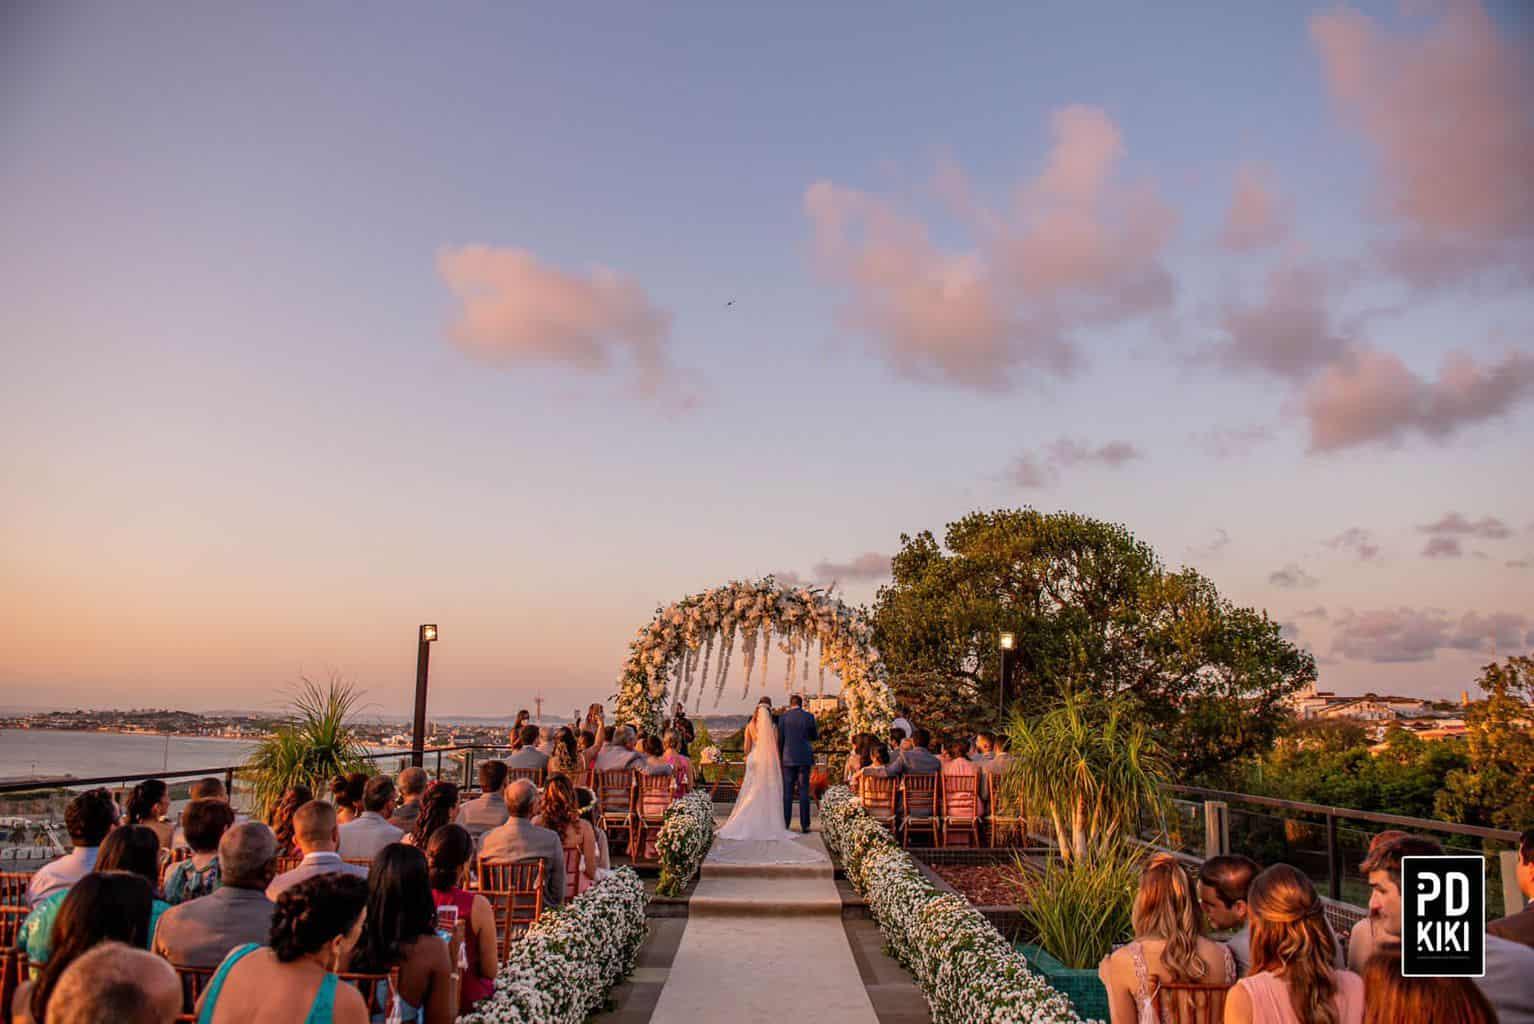 Casamento-na-Casa-Baluarte-Camila-e-Gustavo-Paulo-e-Diego-Kiki-Fotografia00044